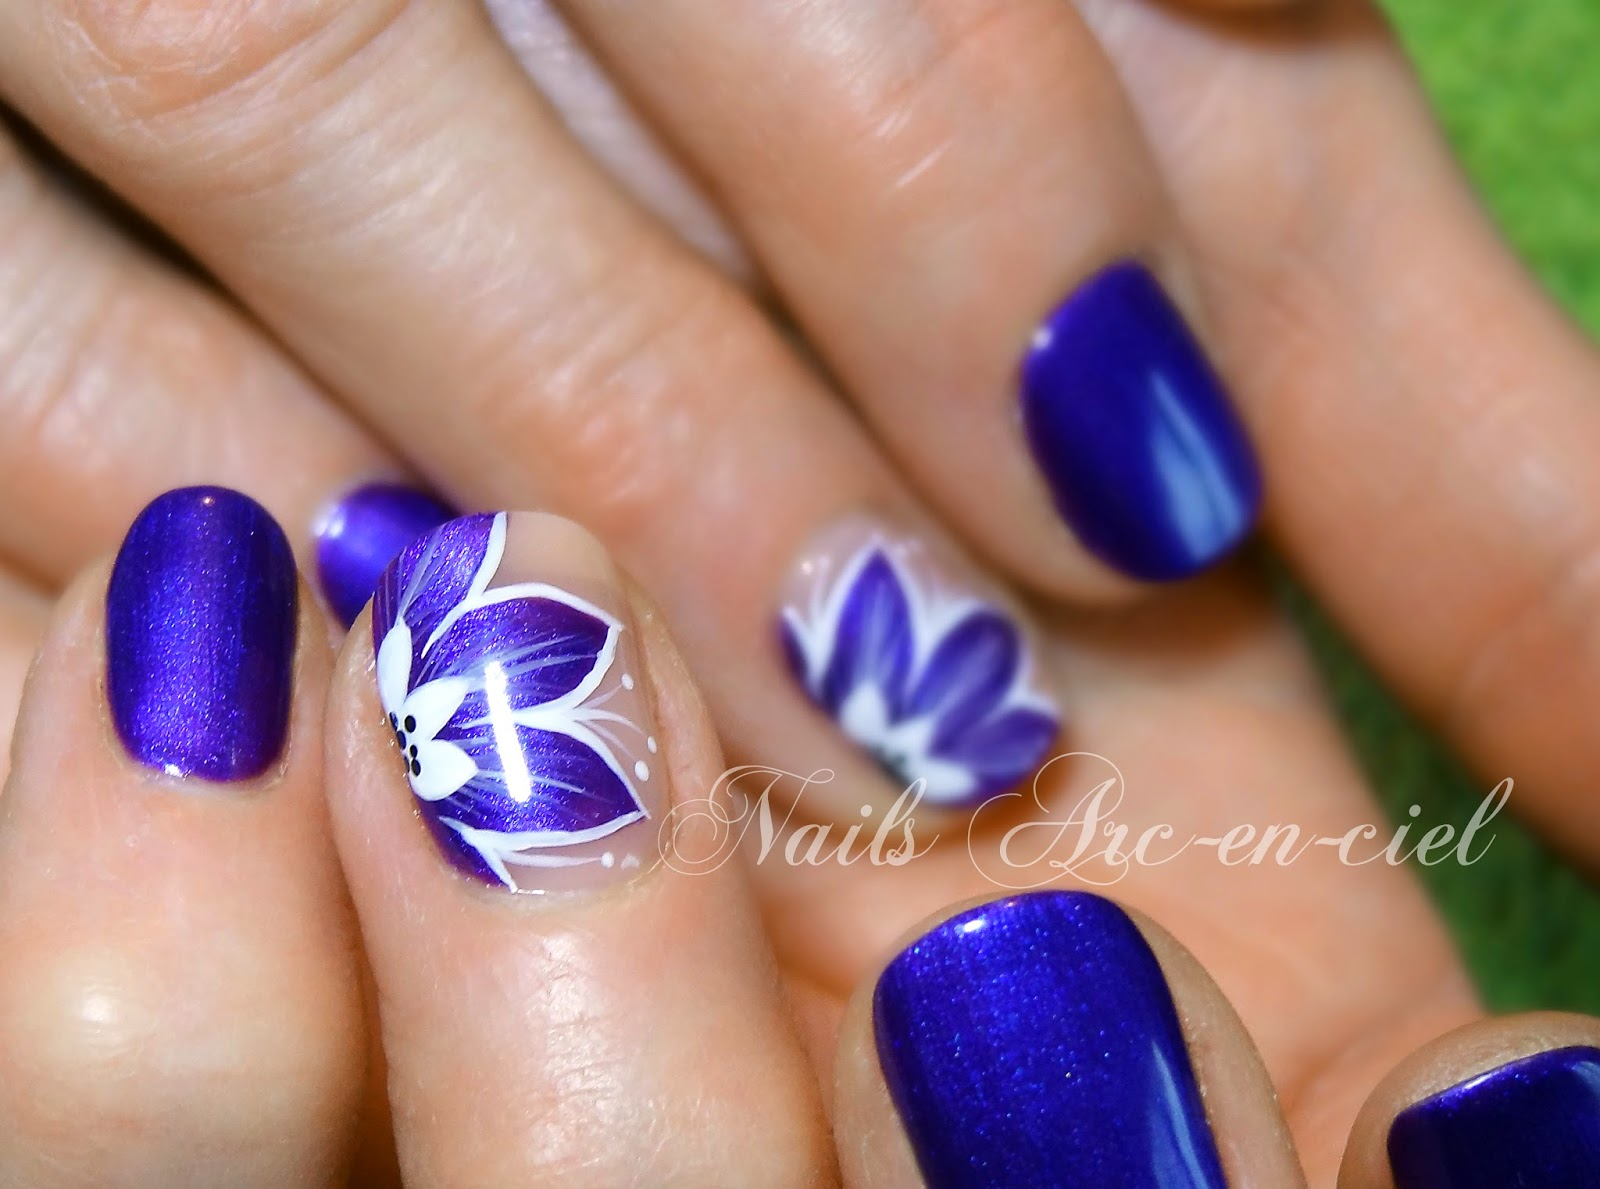 Très Nails Arc-en-ciel: Fleur en vernis semi-permanent AF56